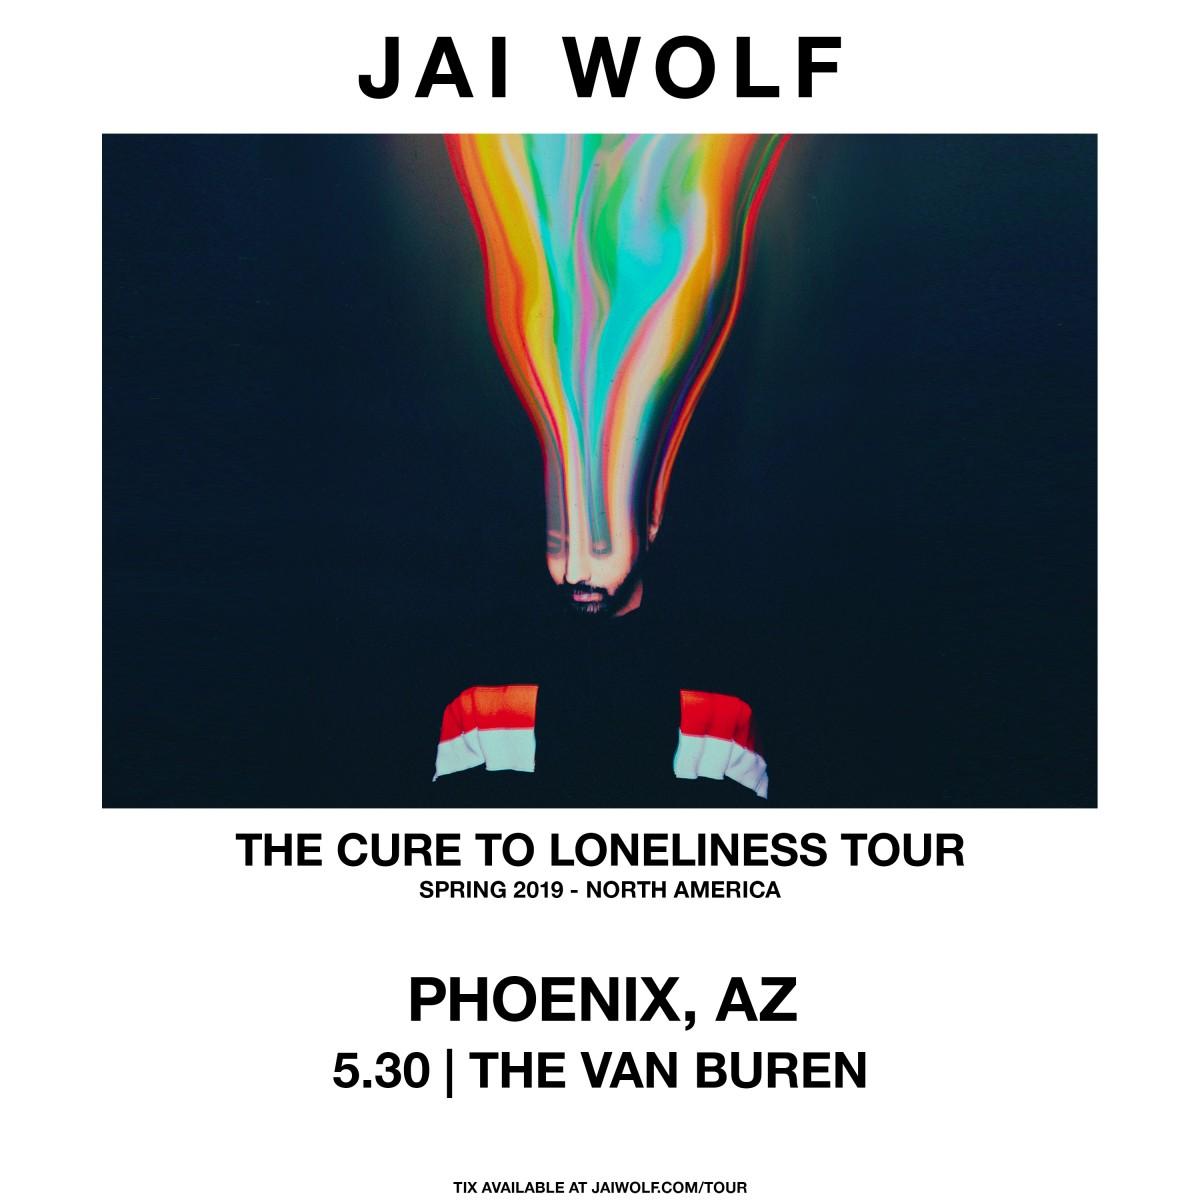 Flyer for Jai Wolf